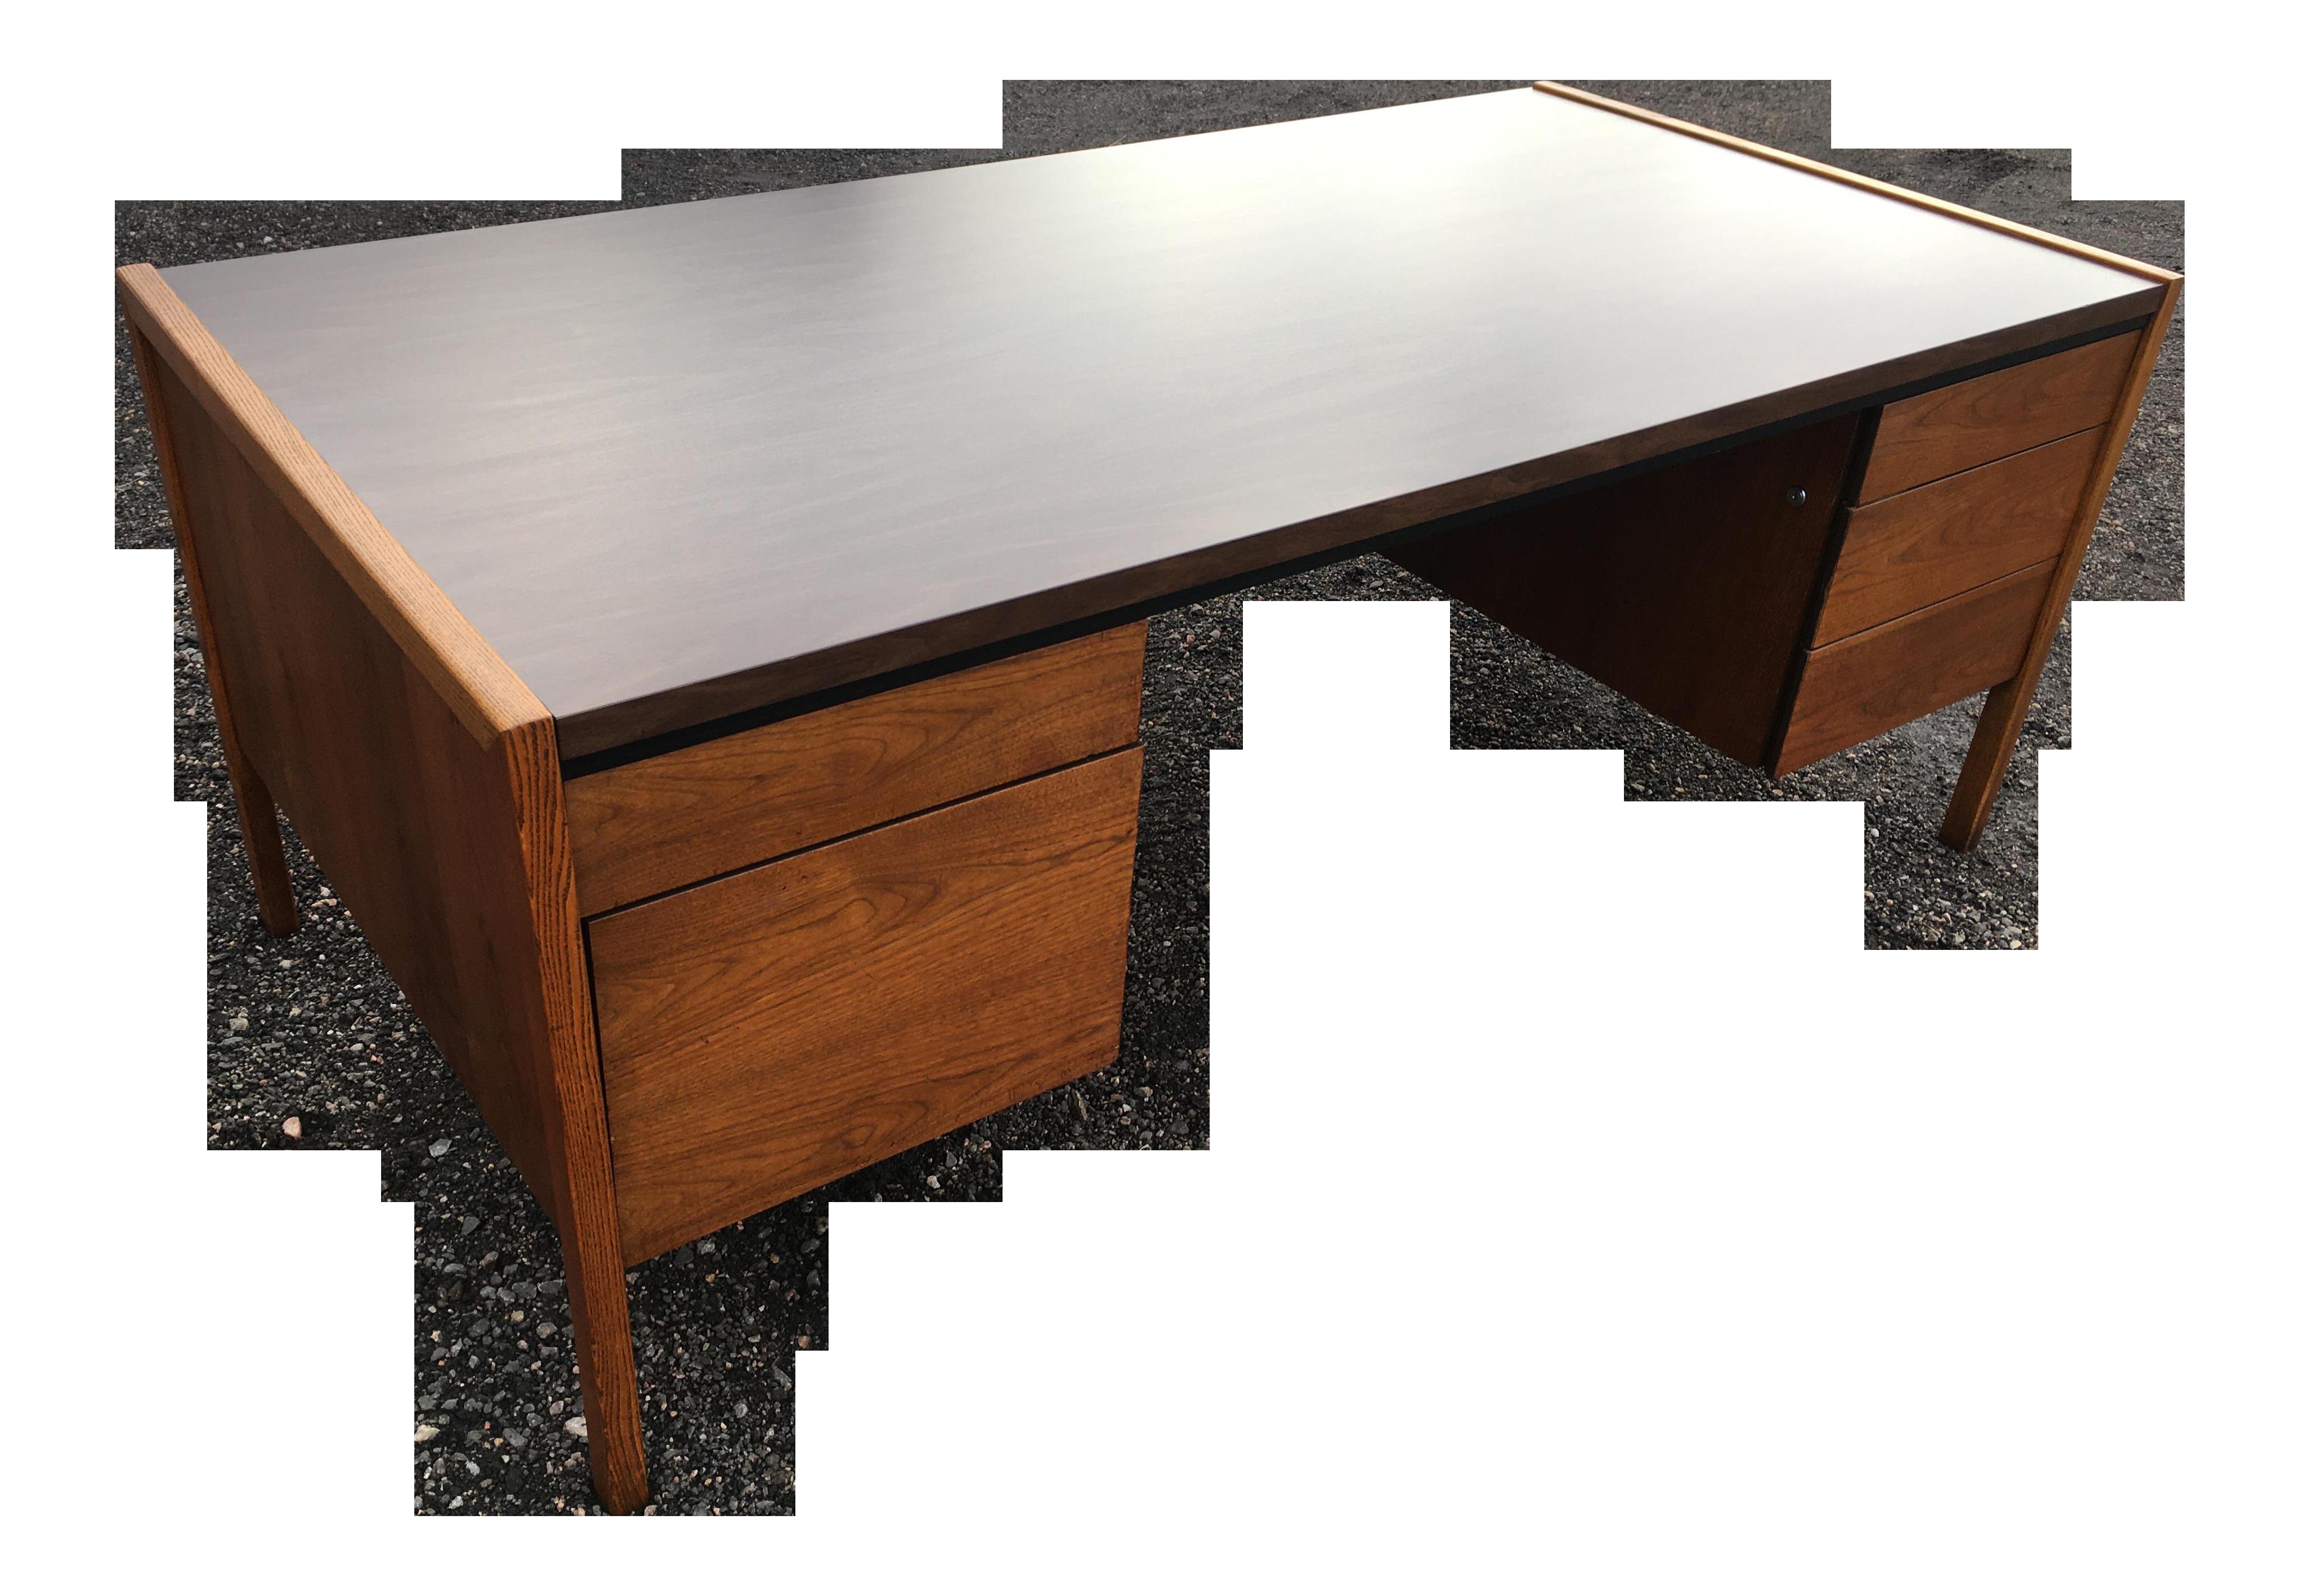 Image of: Mid Century Modern Walnut Executive Desk Manner Of Jens Risom Chairish